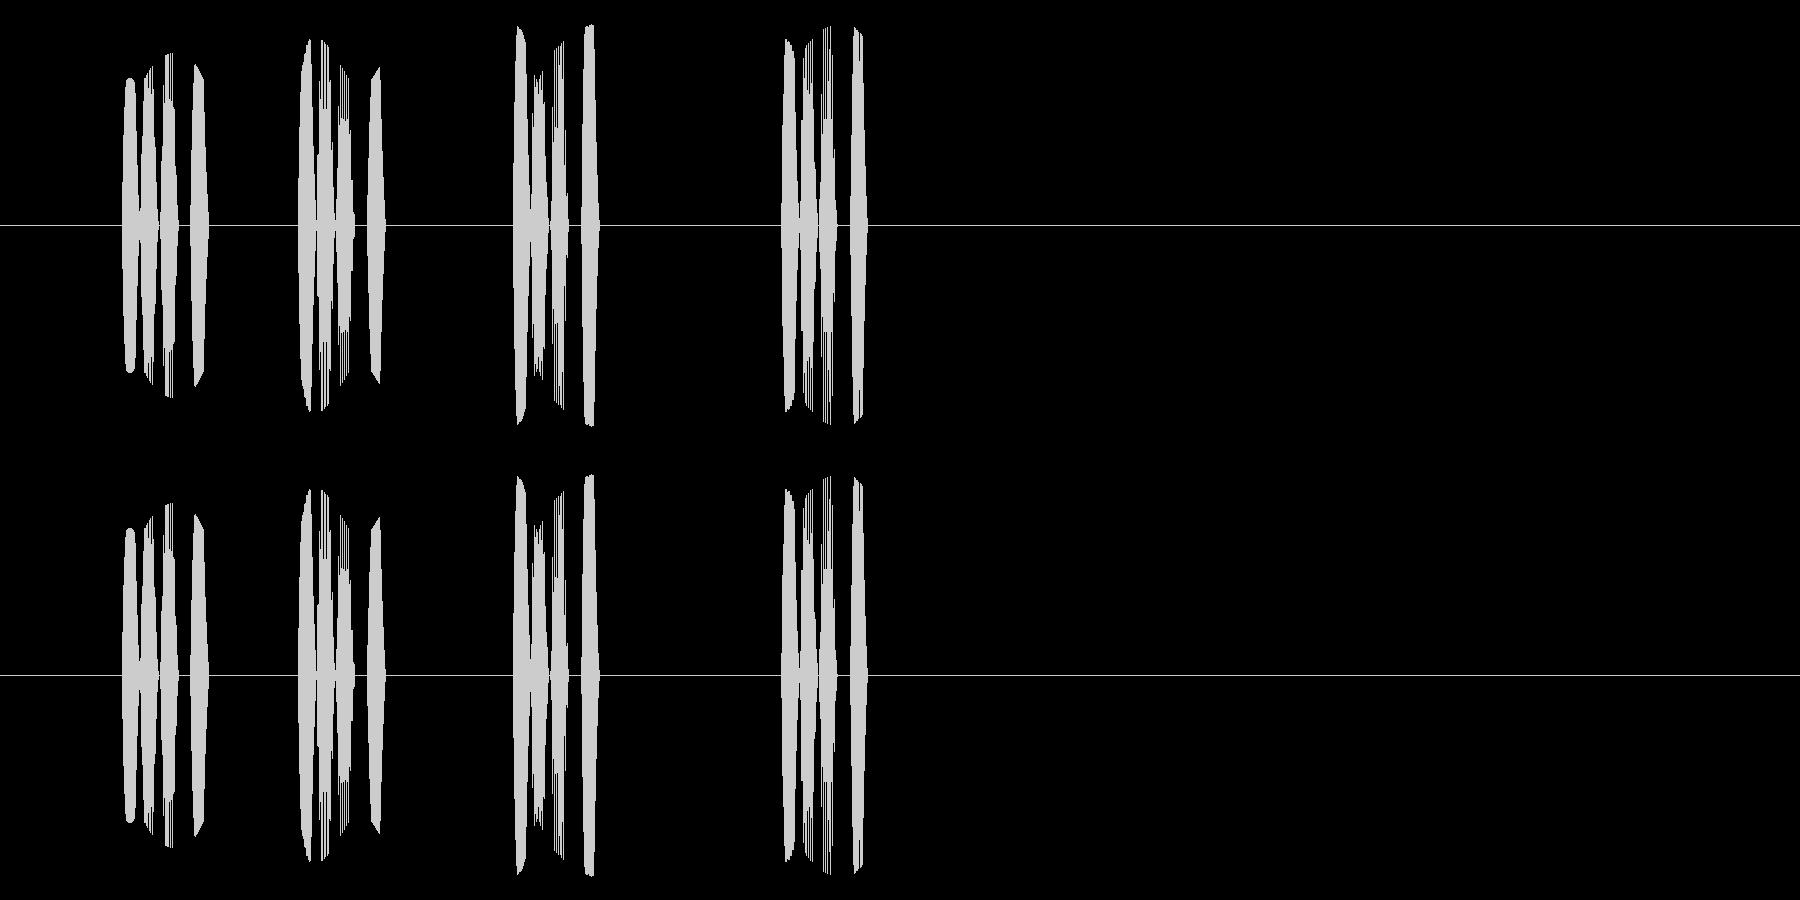 SNES-RPG04-17(魔法 状態)の未再生の波形